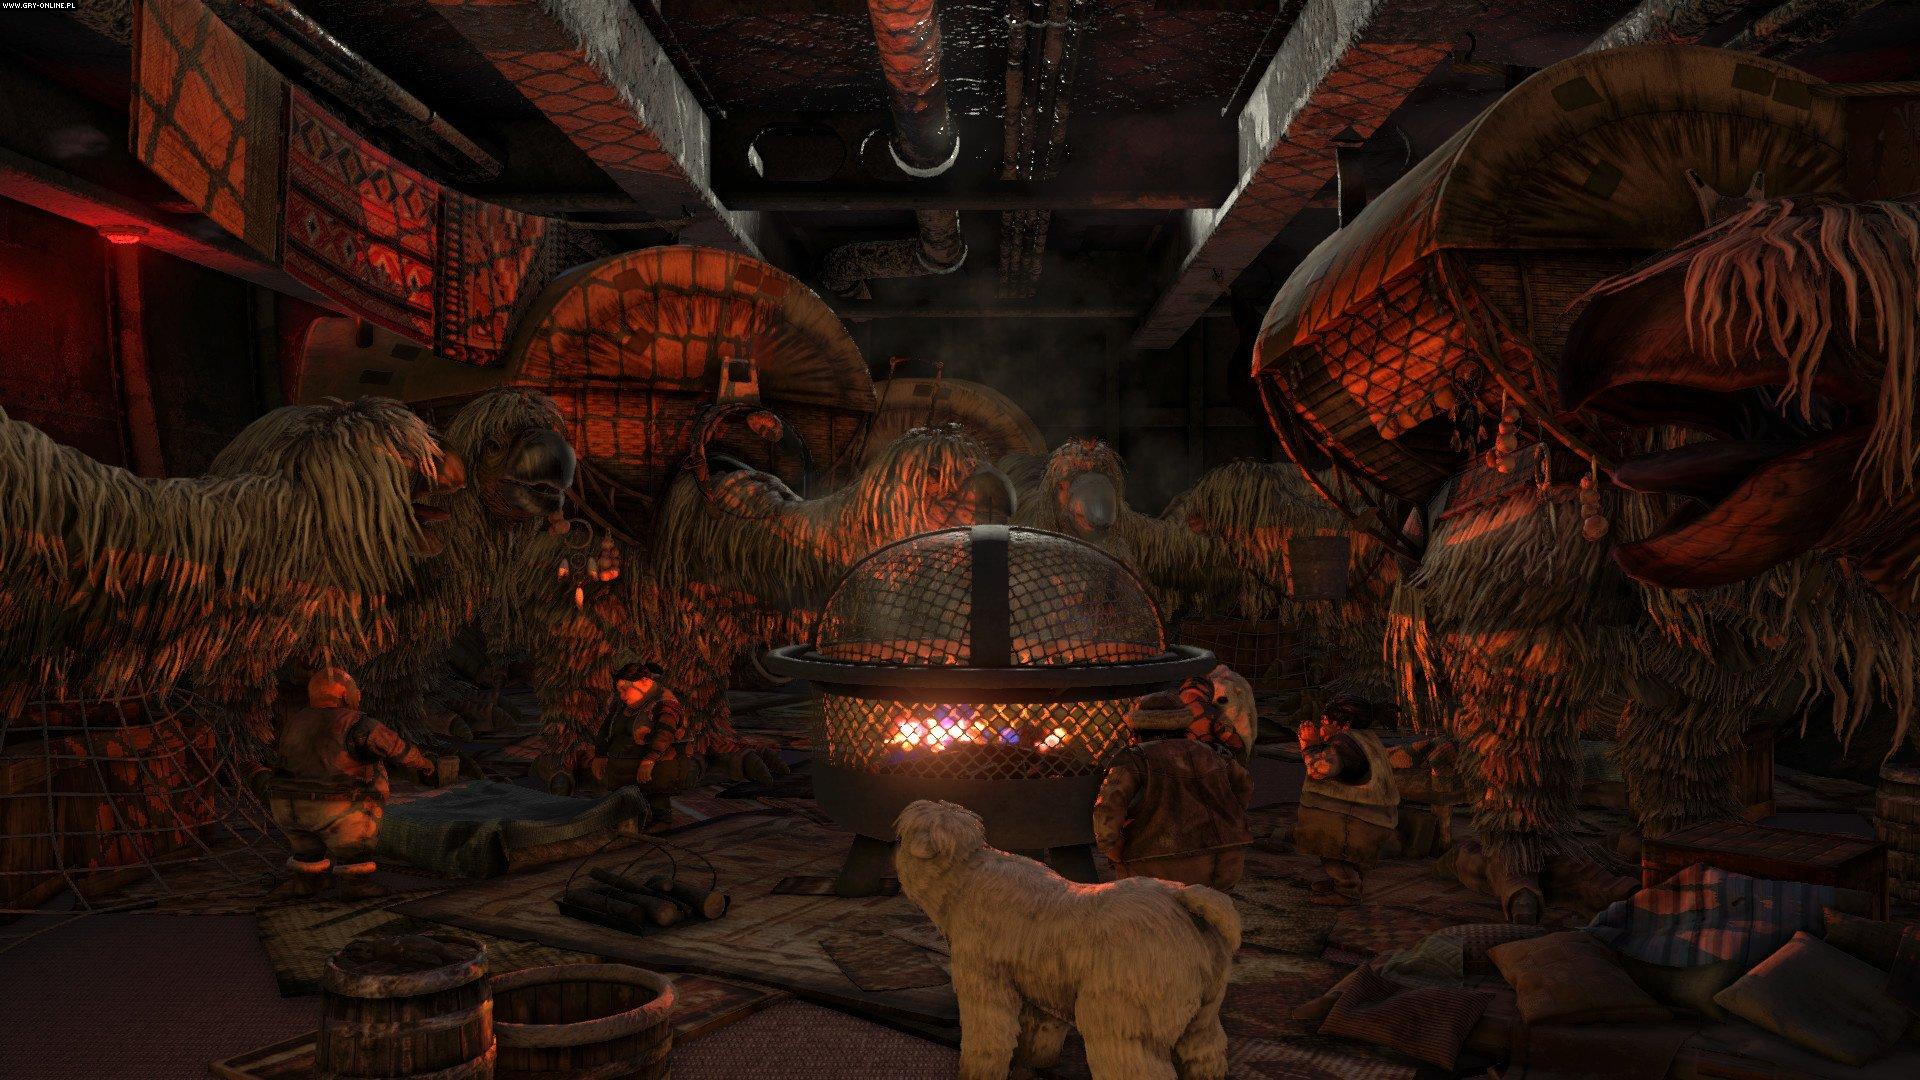 Syberia 3 PC, PS4, XONE Games Image 2/30, Microids/Anuman Interactive